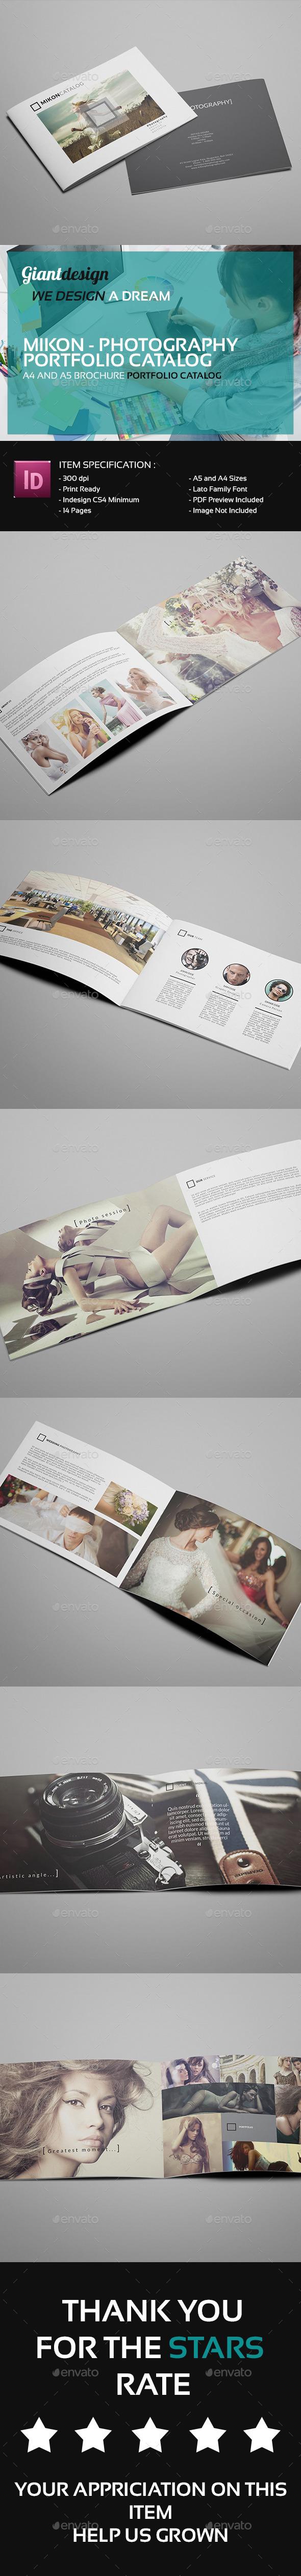 GraphicRiver Mikon Photography Portfolio Catalog 9688712